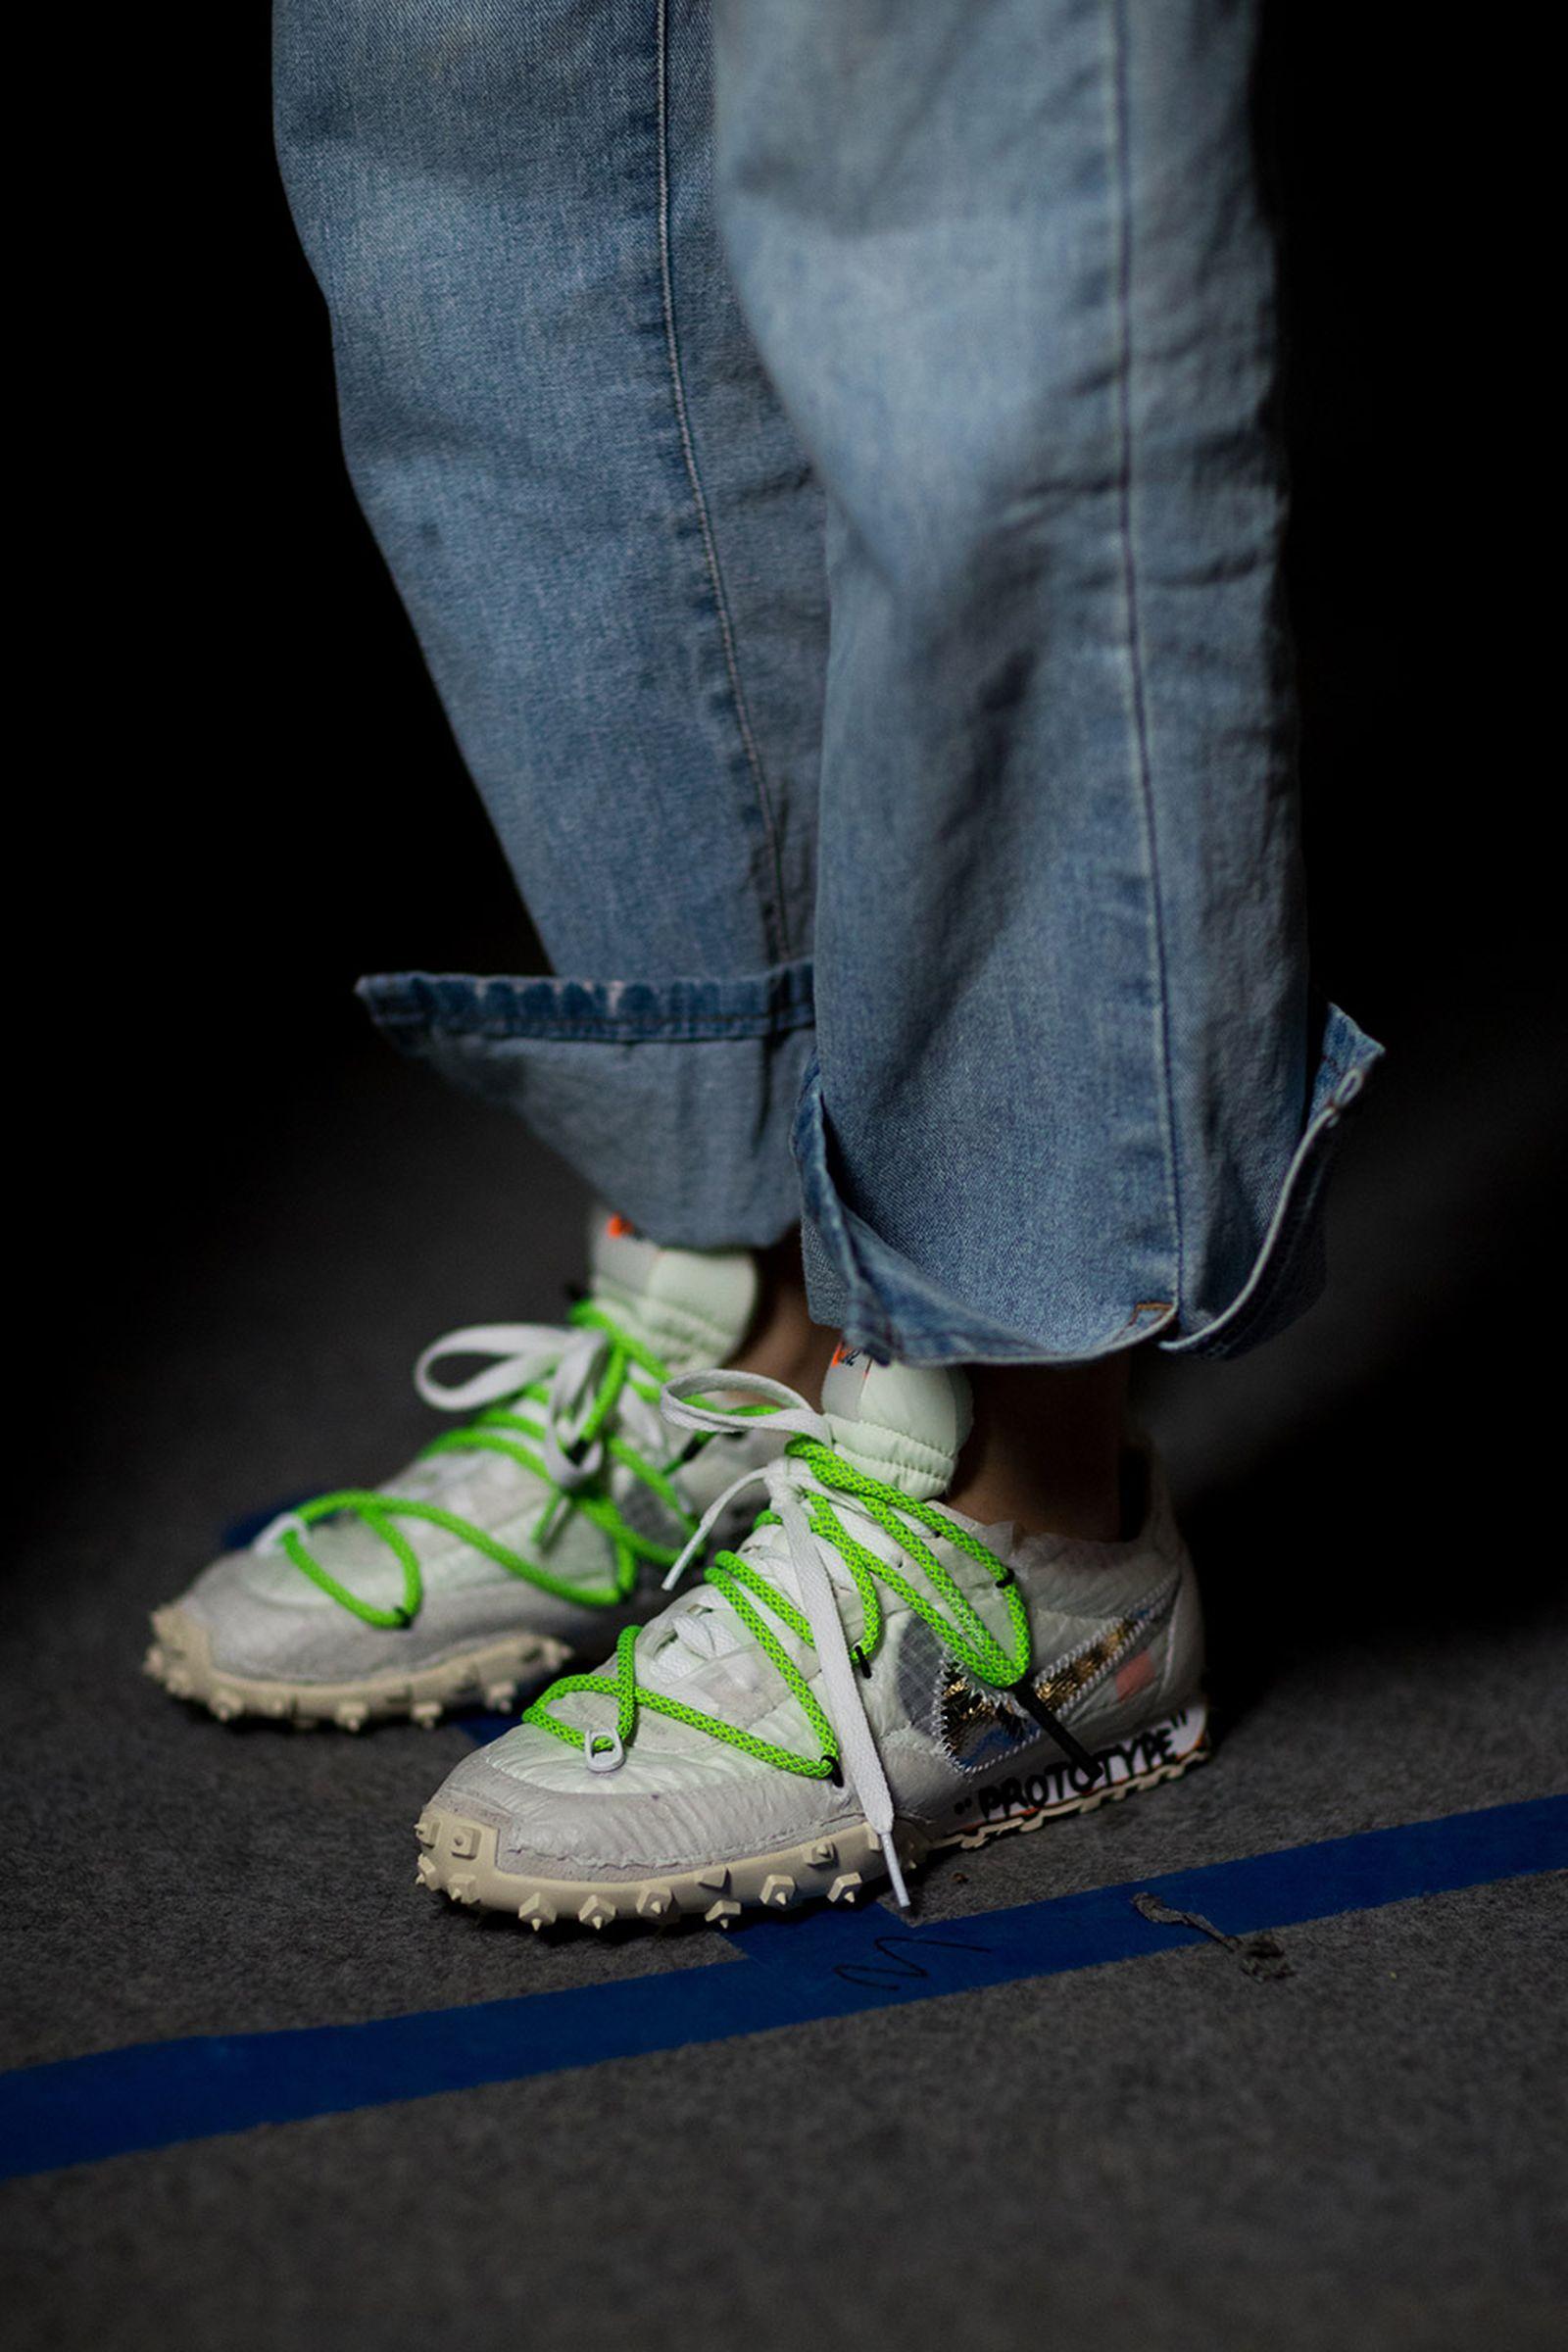 off white pfw ss19 footwear closer look OFF-WHITE c/o Virgil Abloh Paris Fashion Week SS19